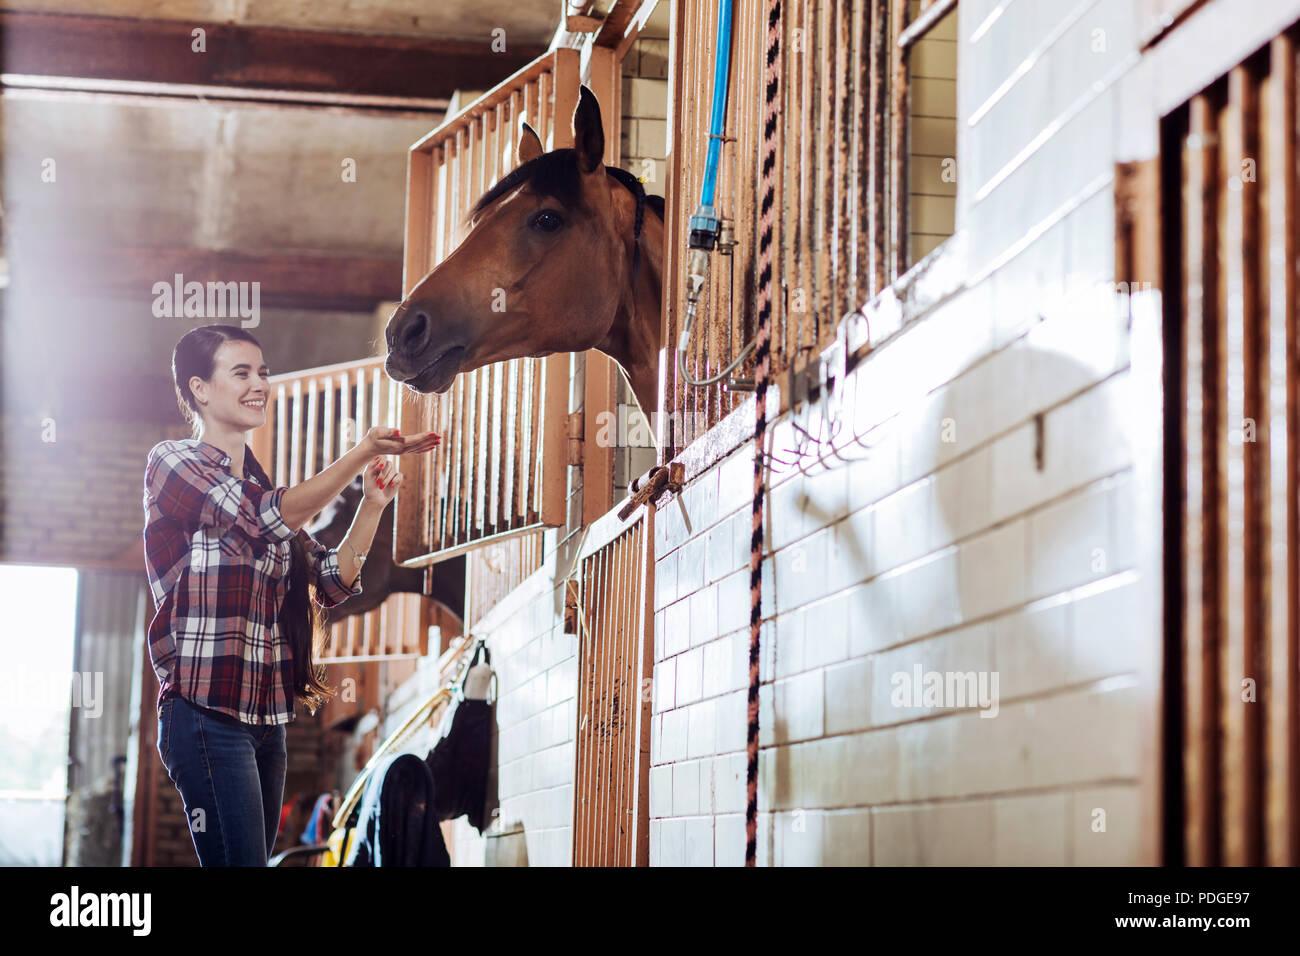 Woman feeling entertained while feeding beautiful horse - Stock Image